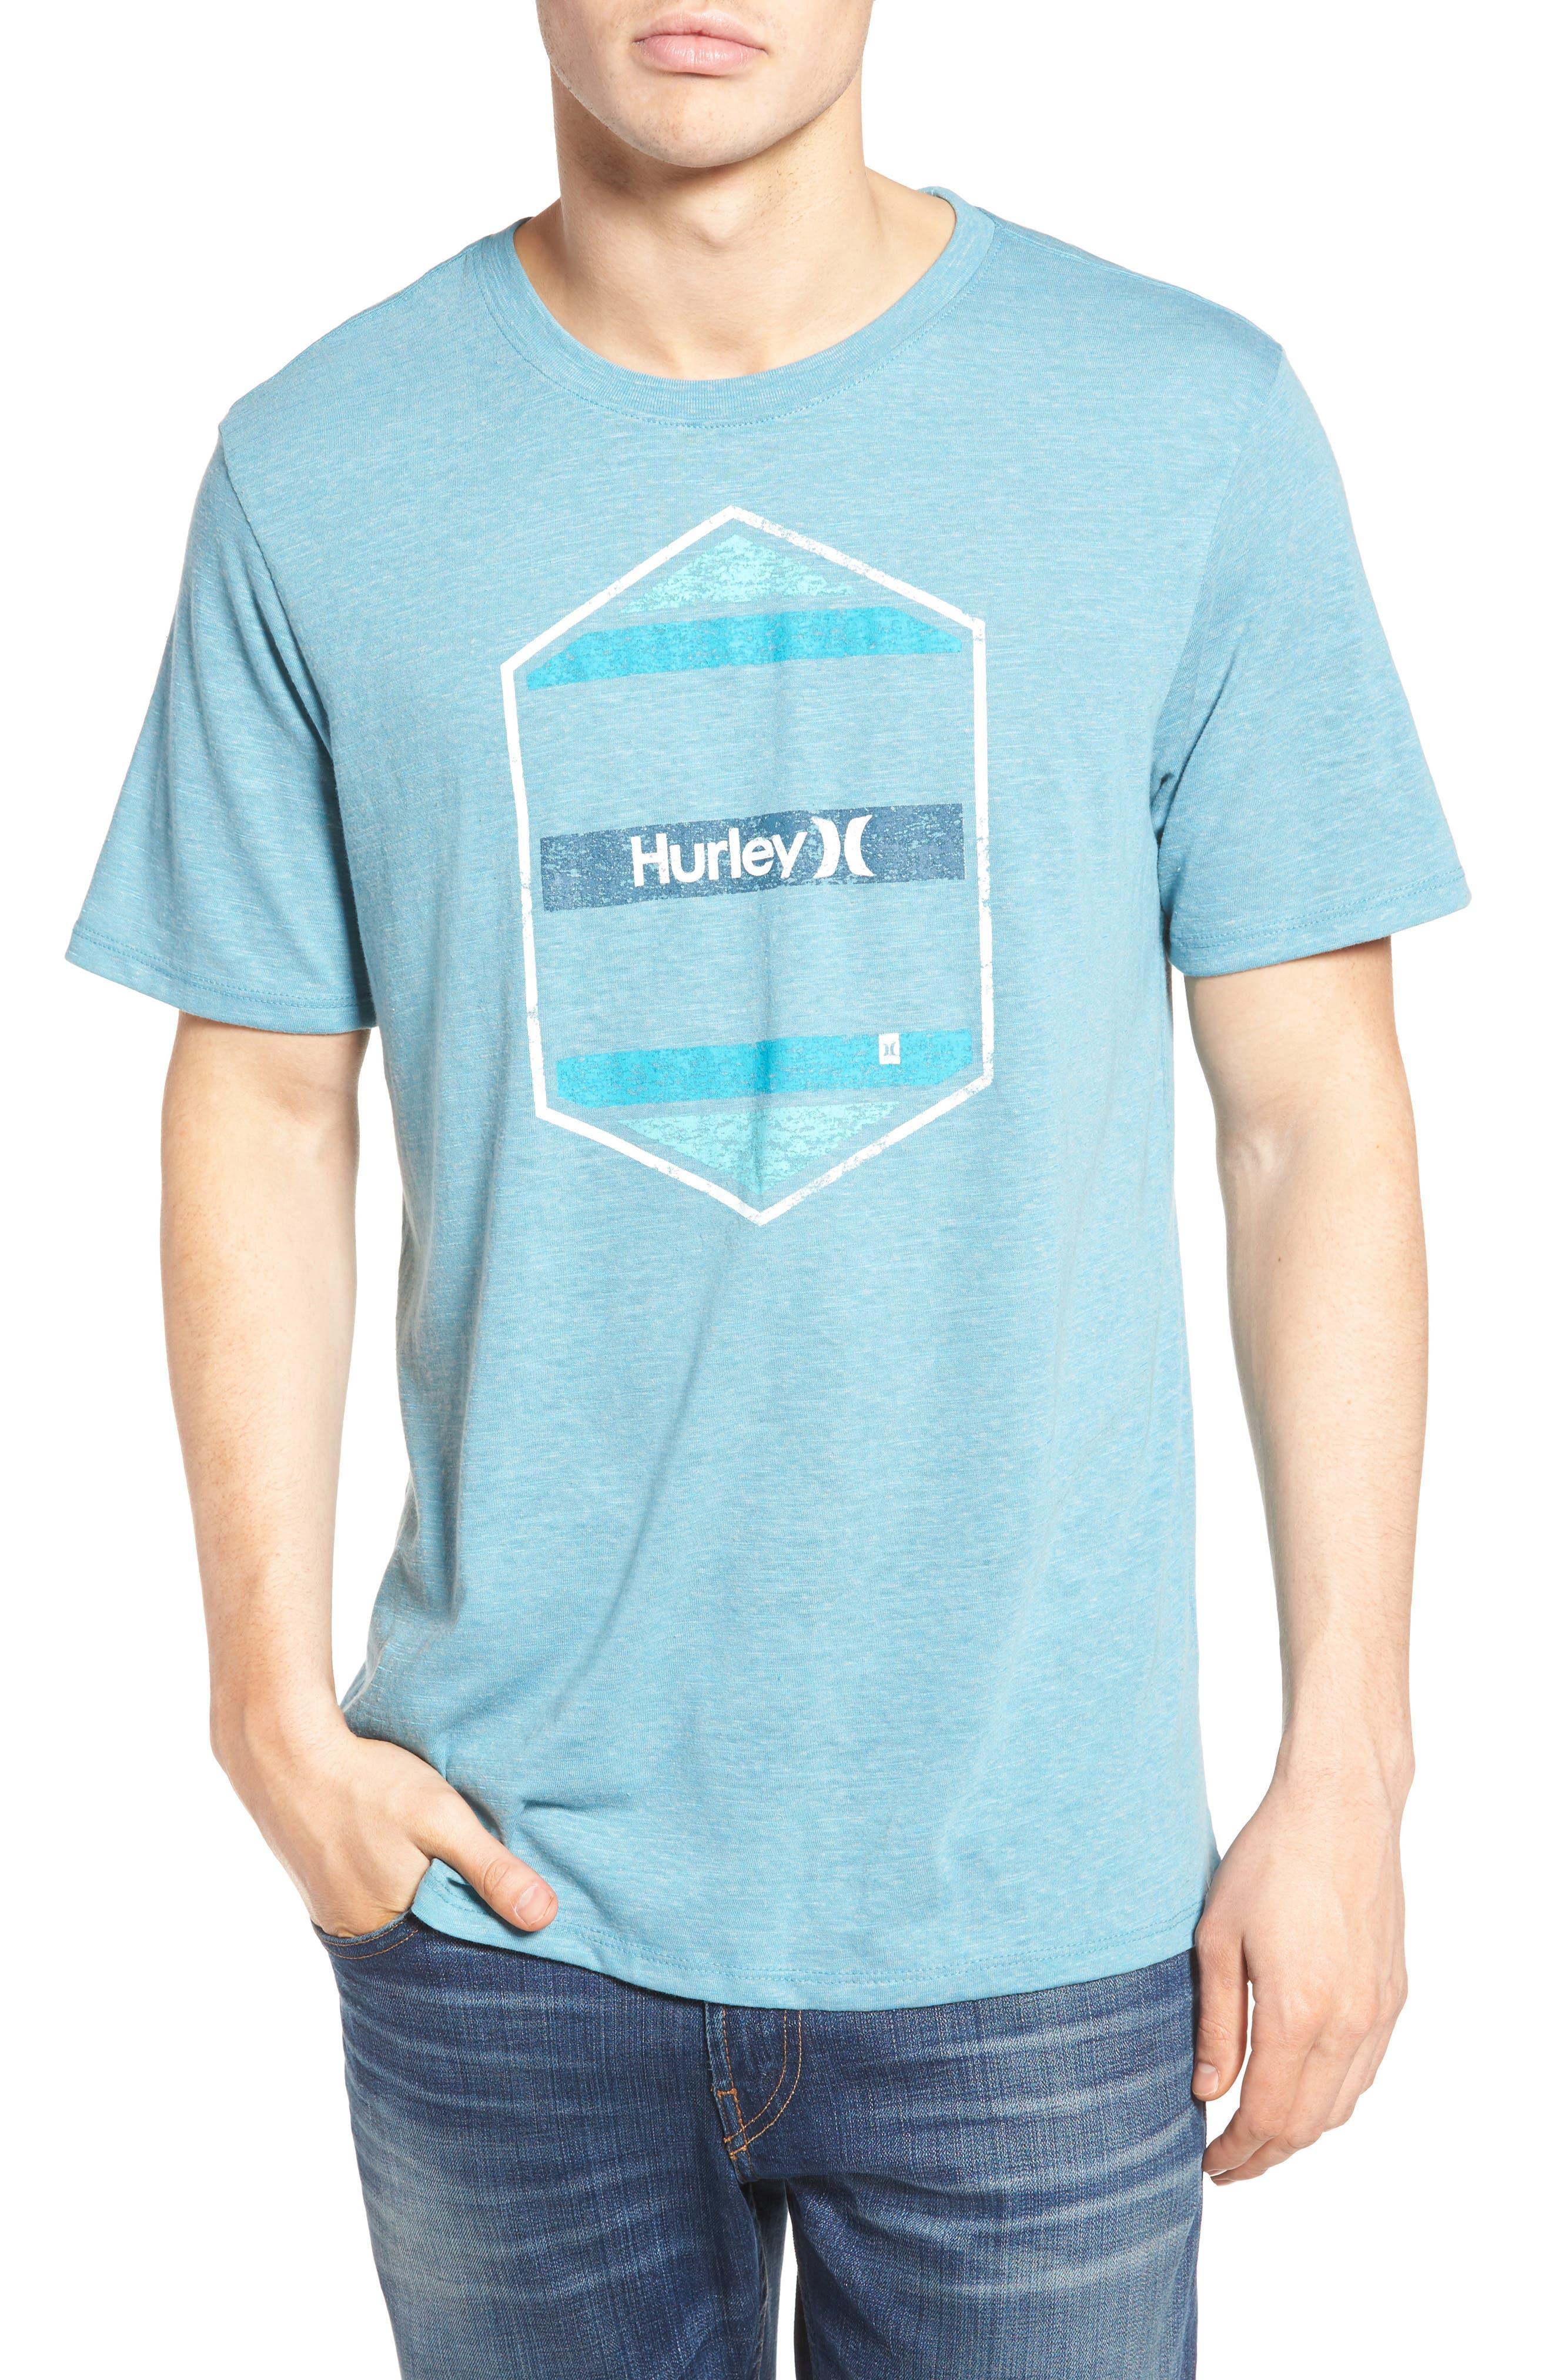 Hurley Maker Logo Graphic T-Shirt